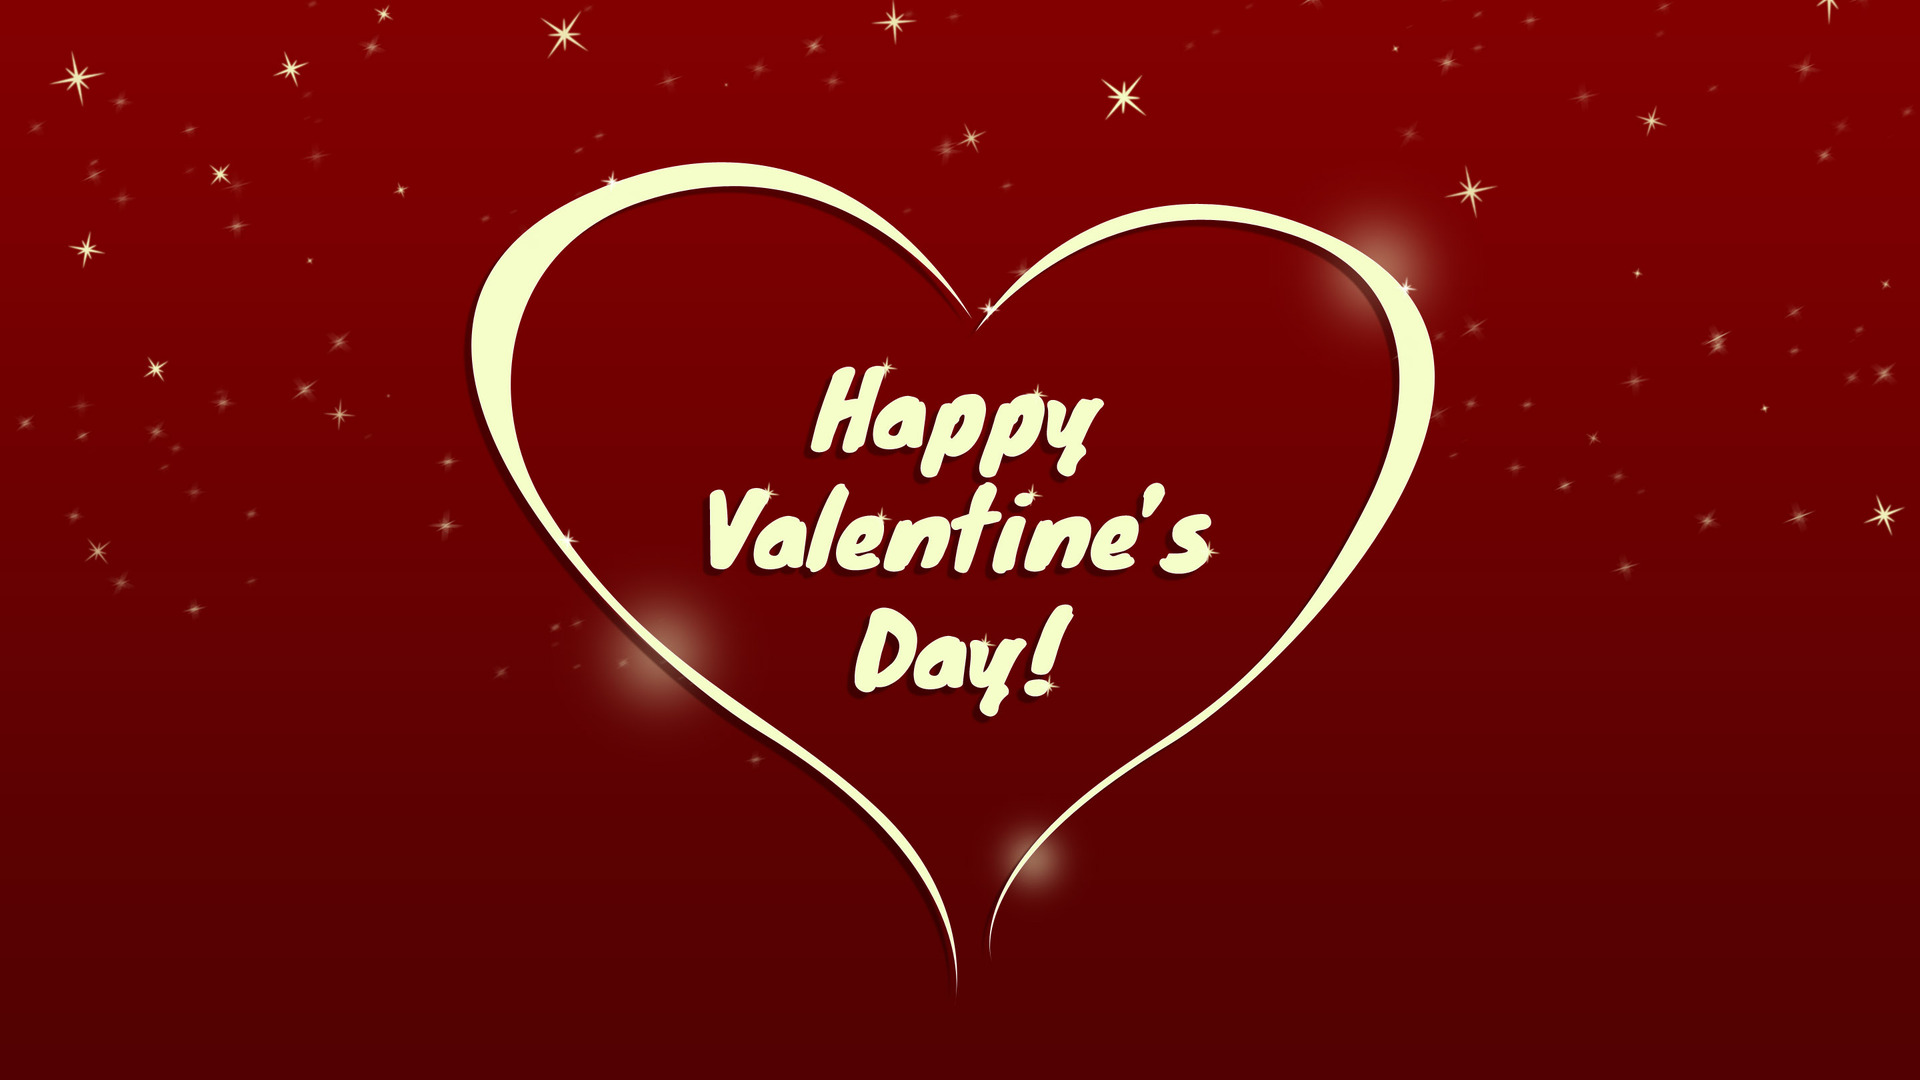 Hd Wallpaper Valentines Day